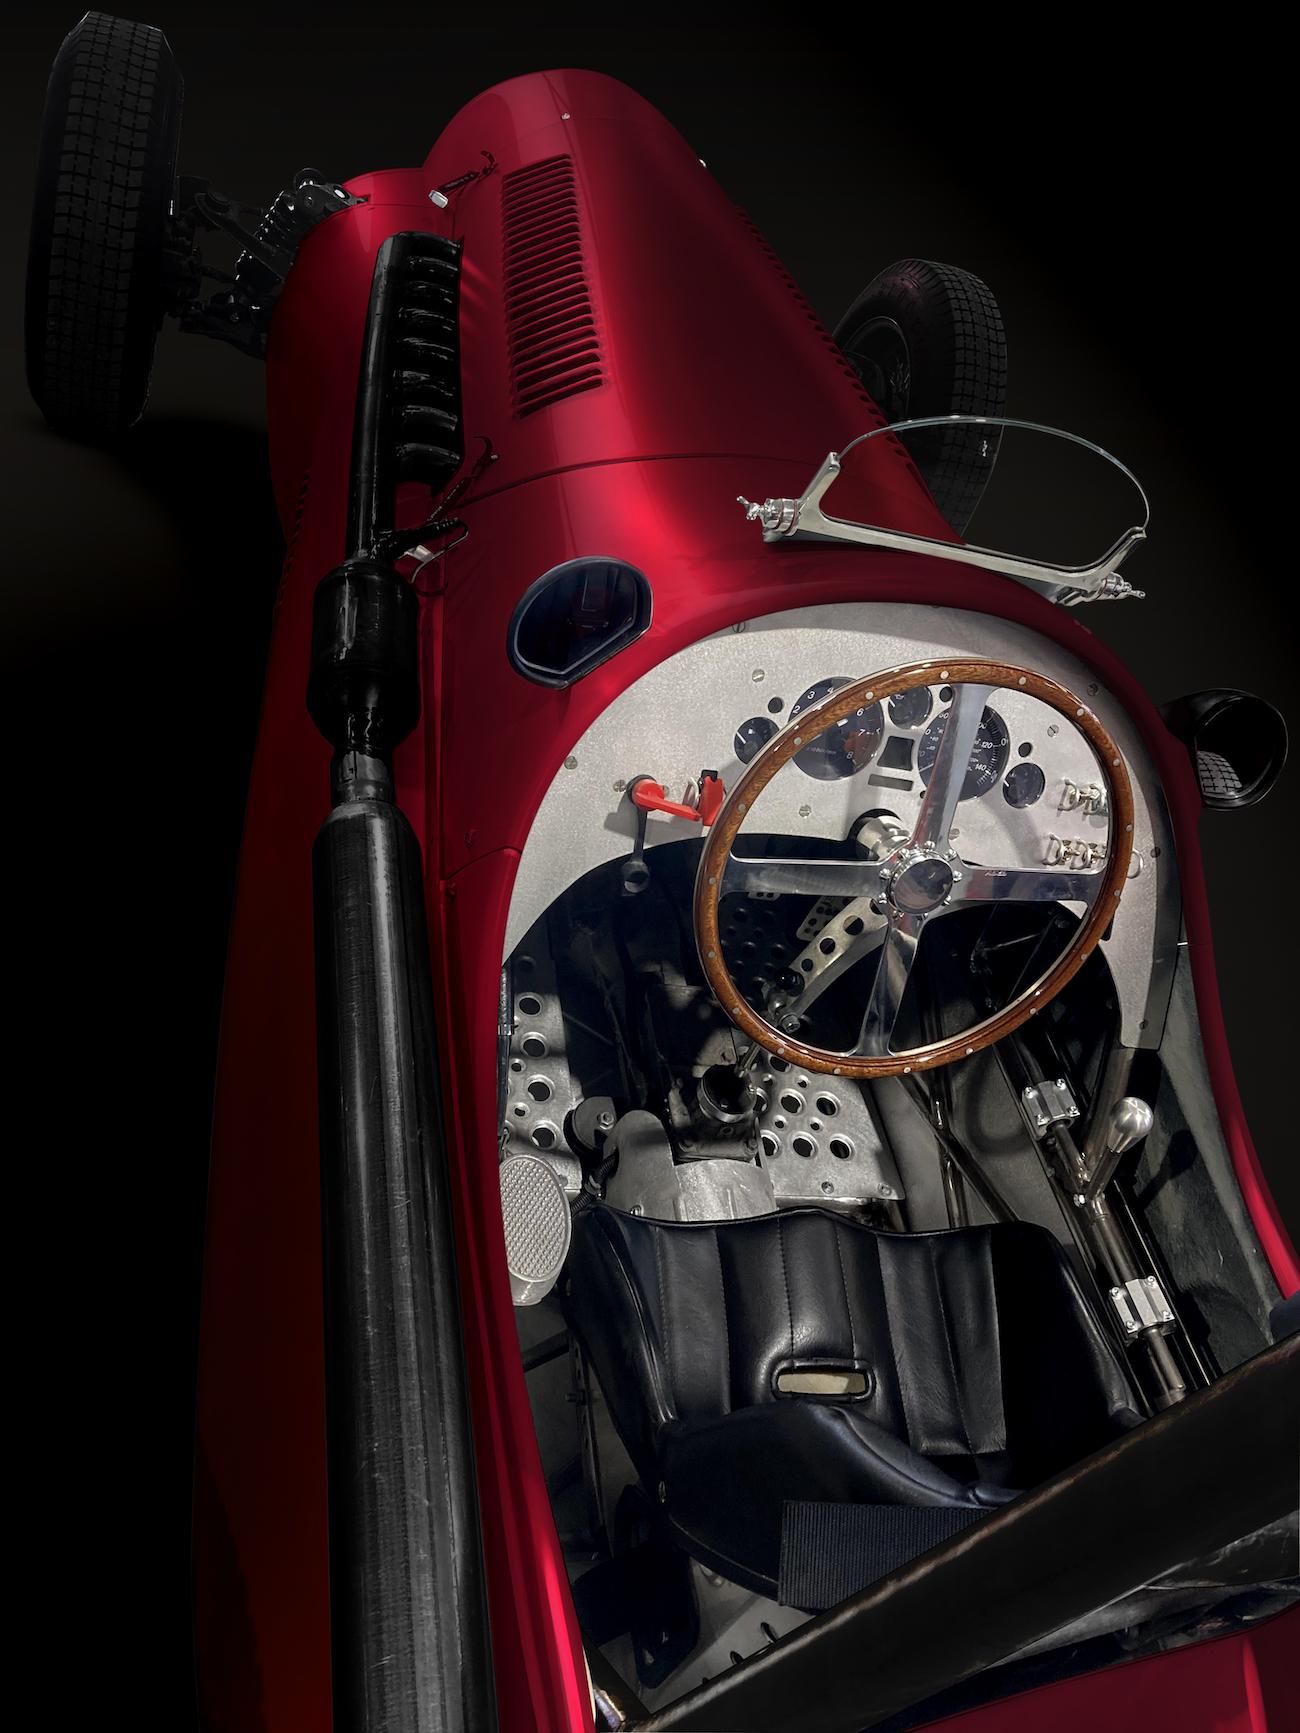 Alfa Romeo Tipo 184 mazda mx5 - 1